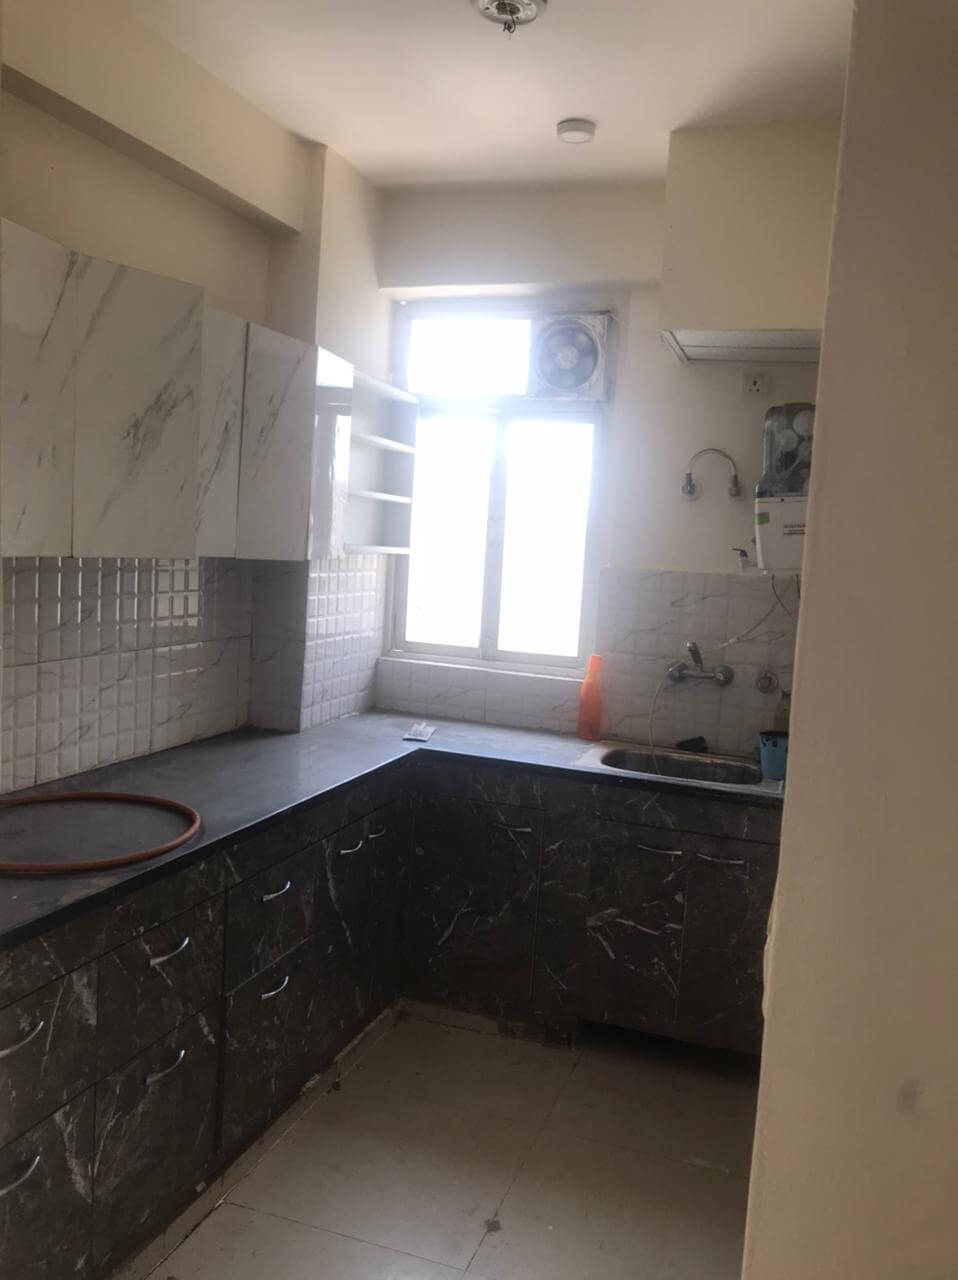 Gna2 H-1701 kitchen.jpeg